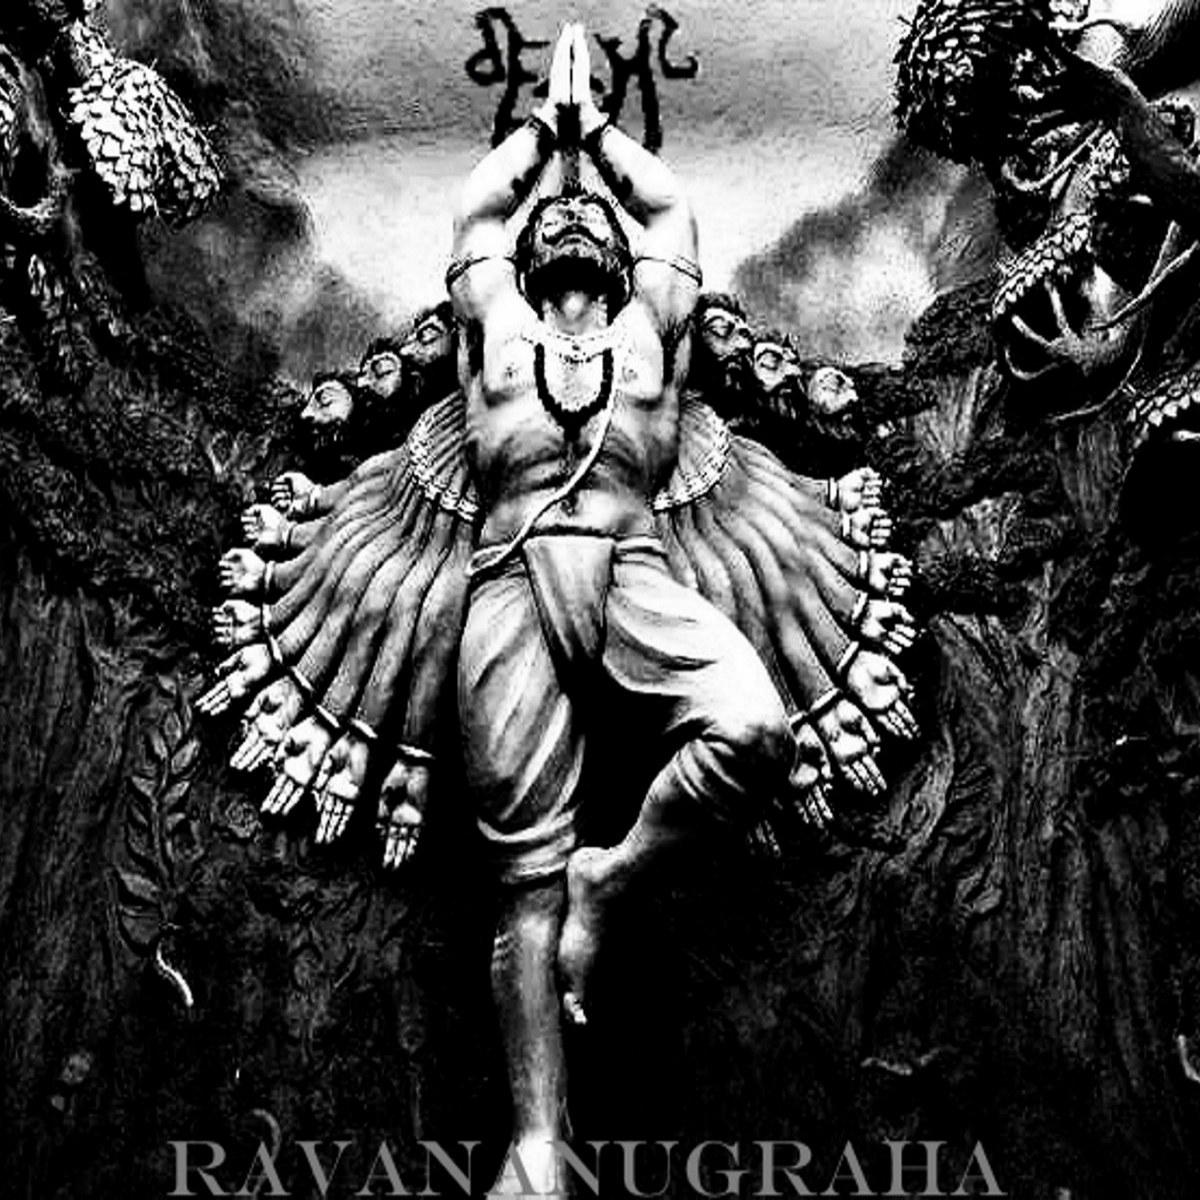 Review for Evanoth - Ravananugraha